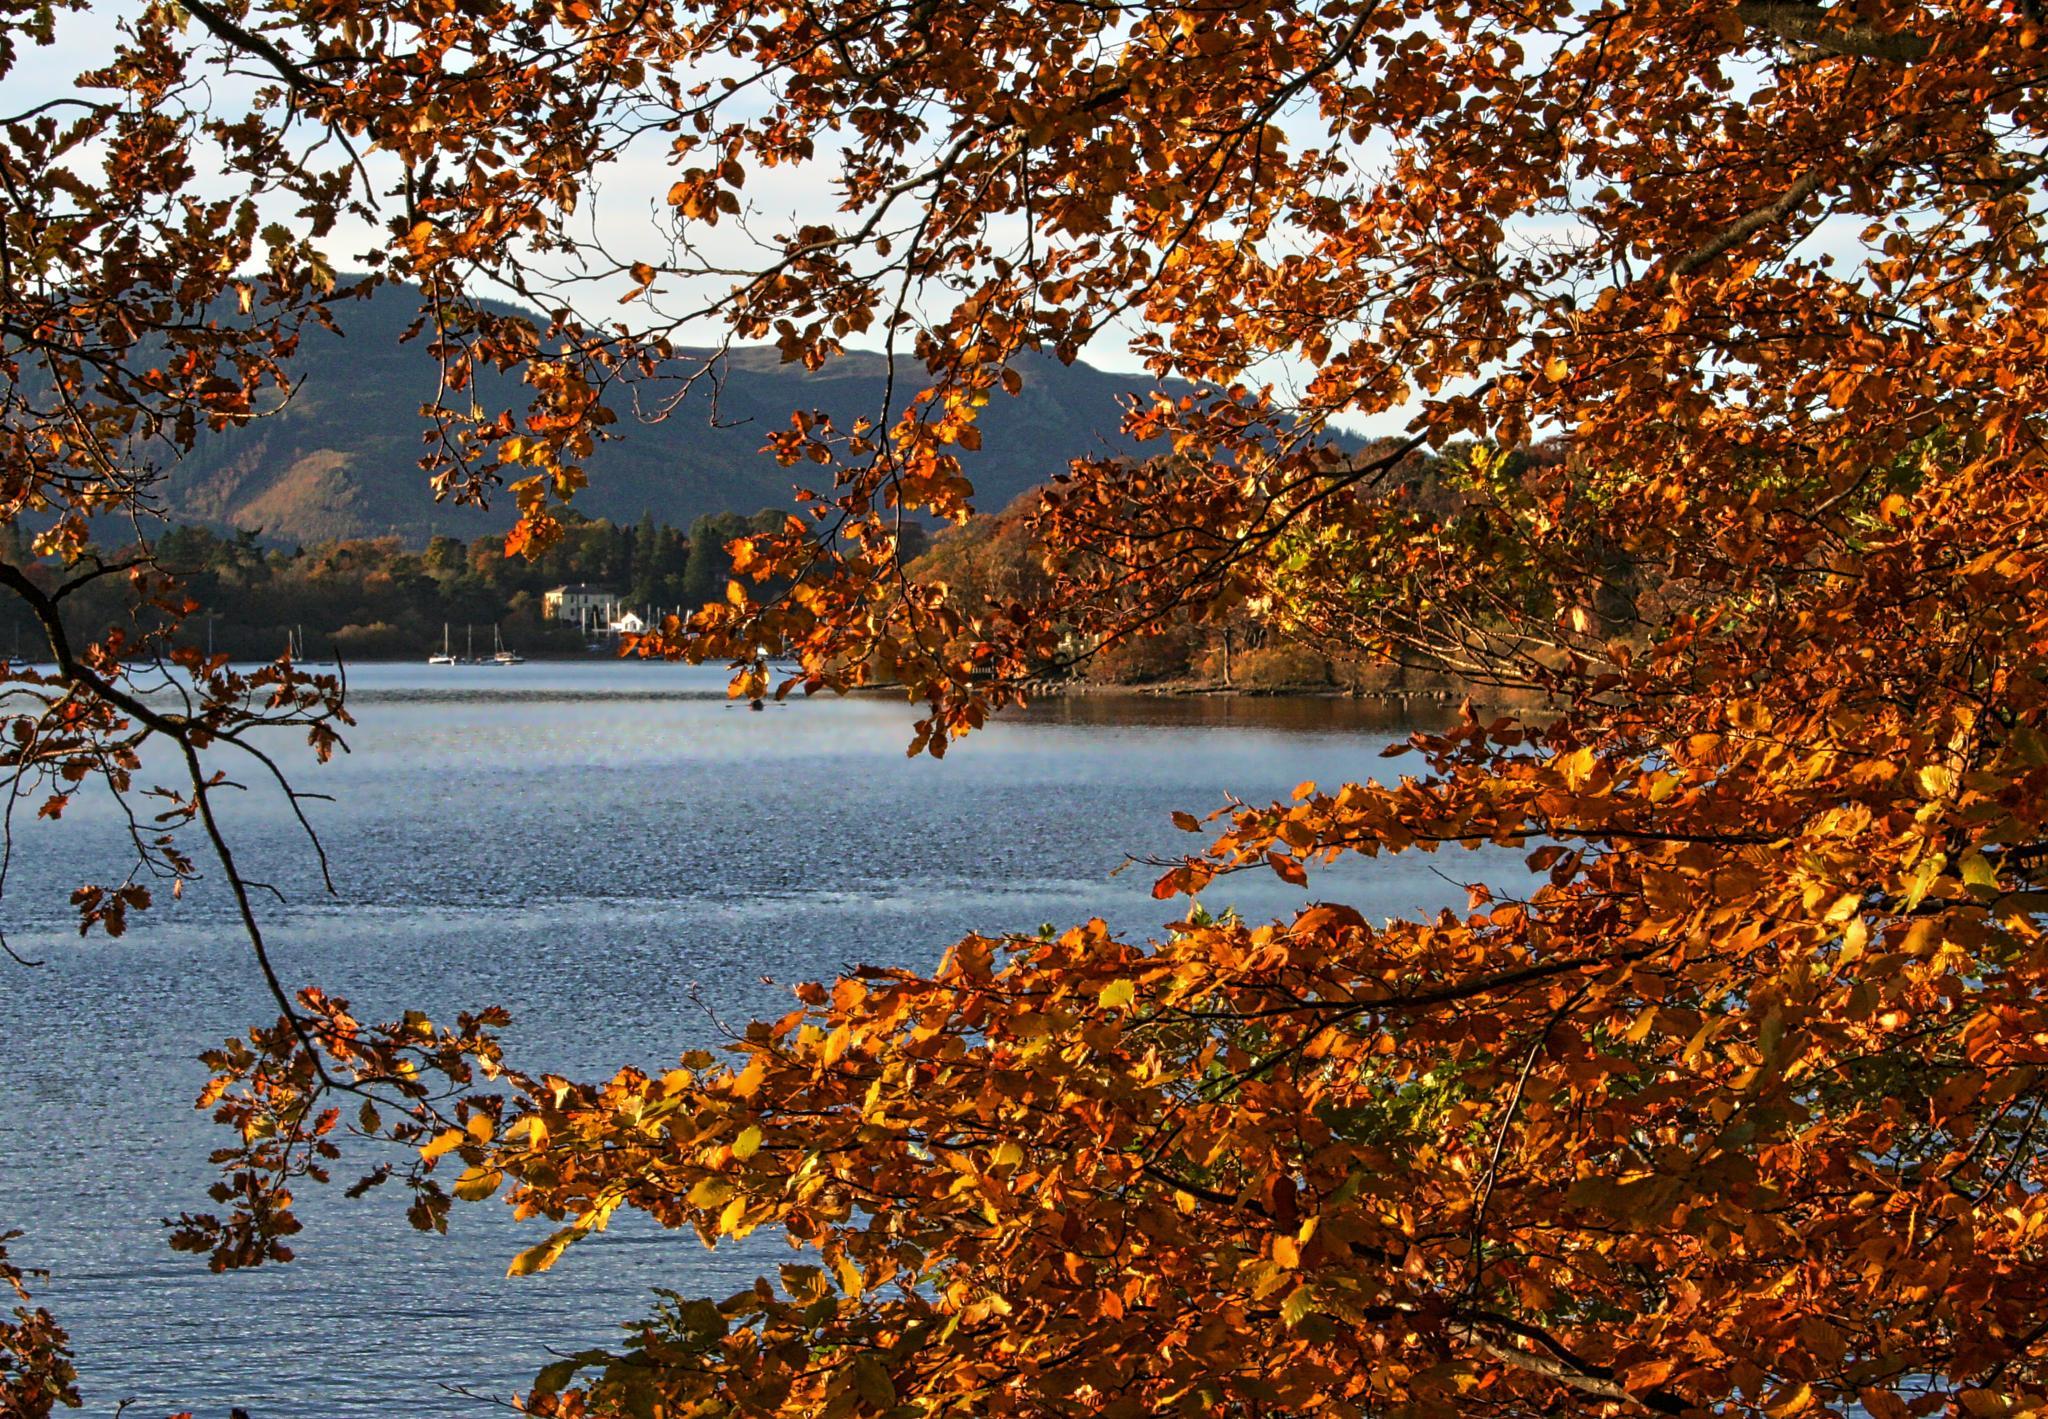 autumn in lakeland by steveworrll